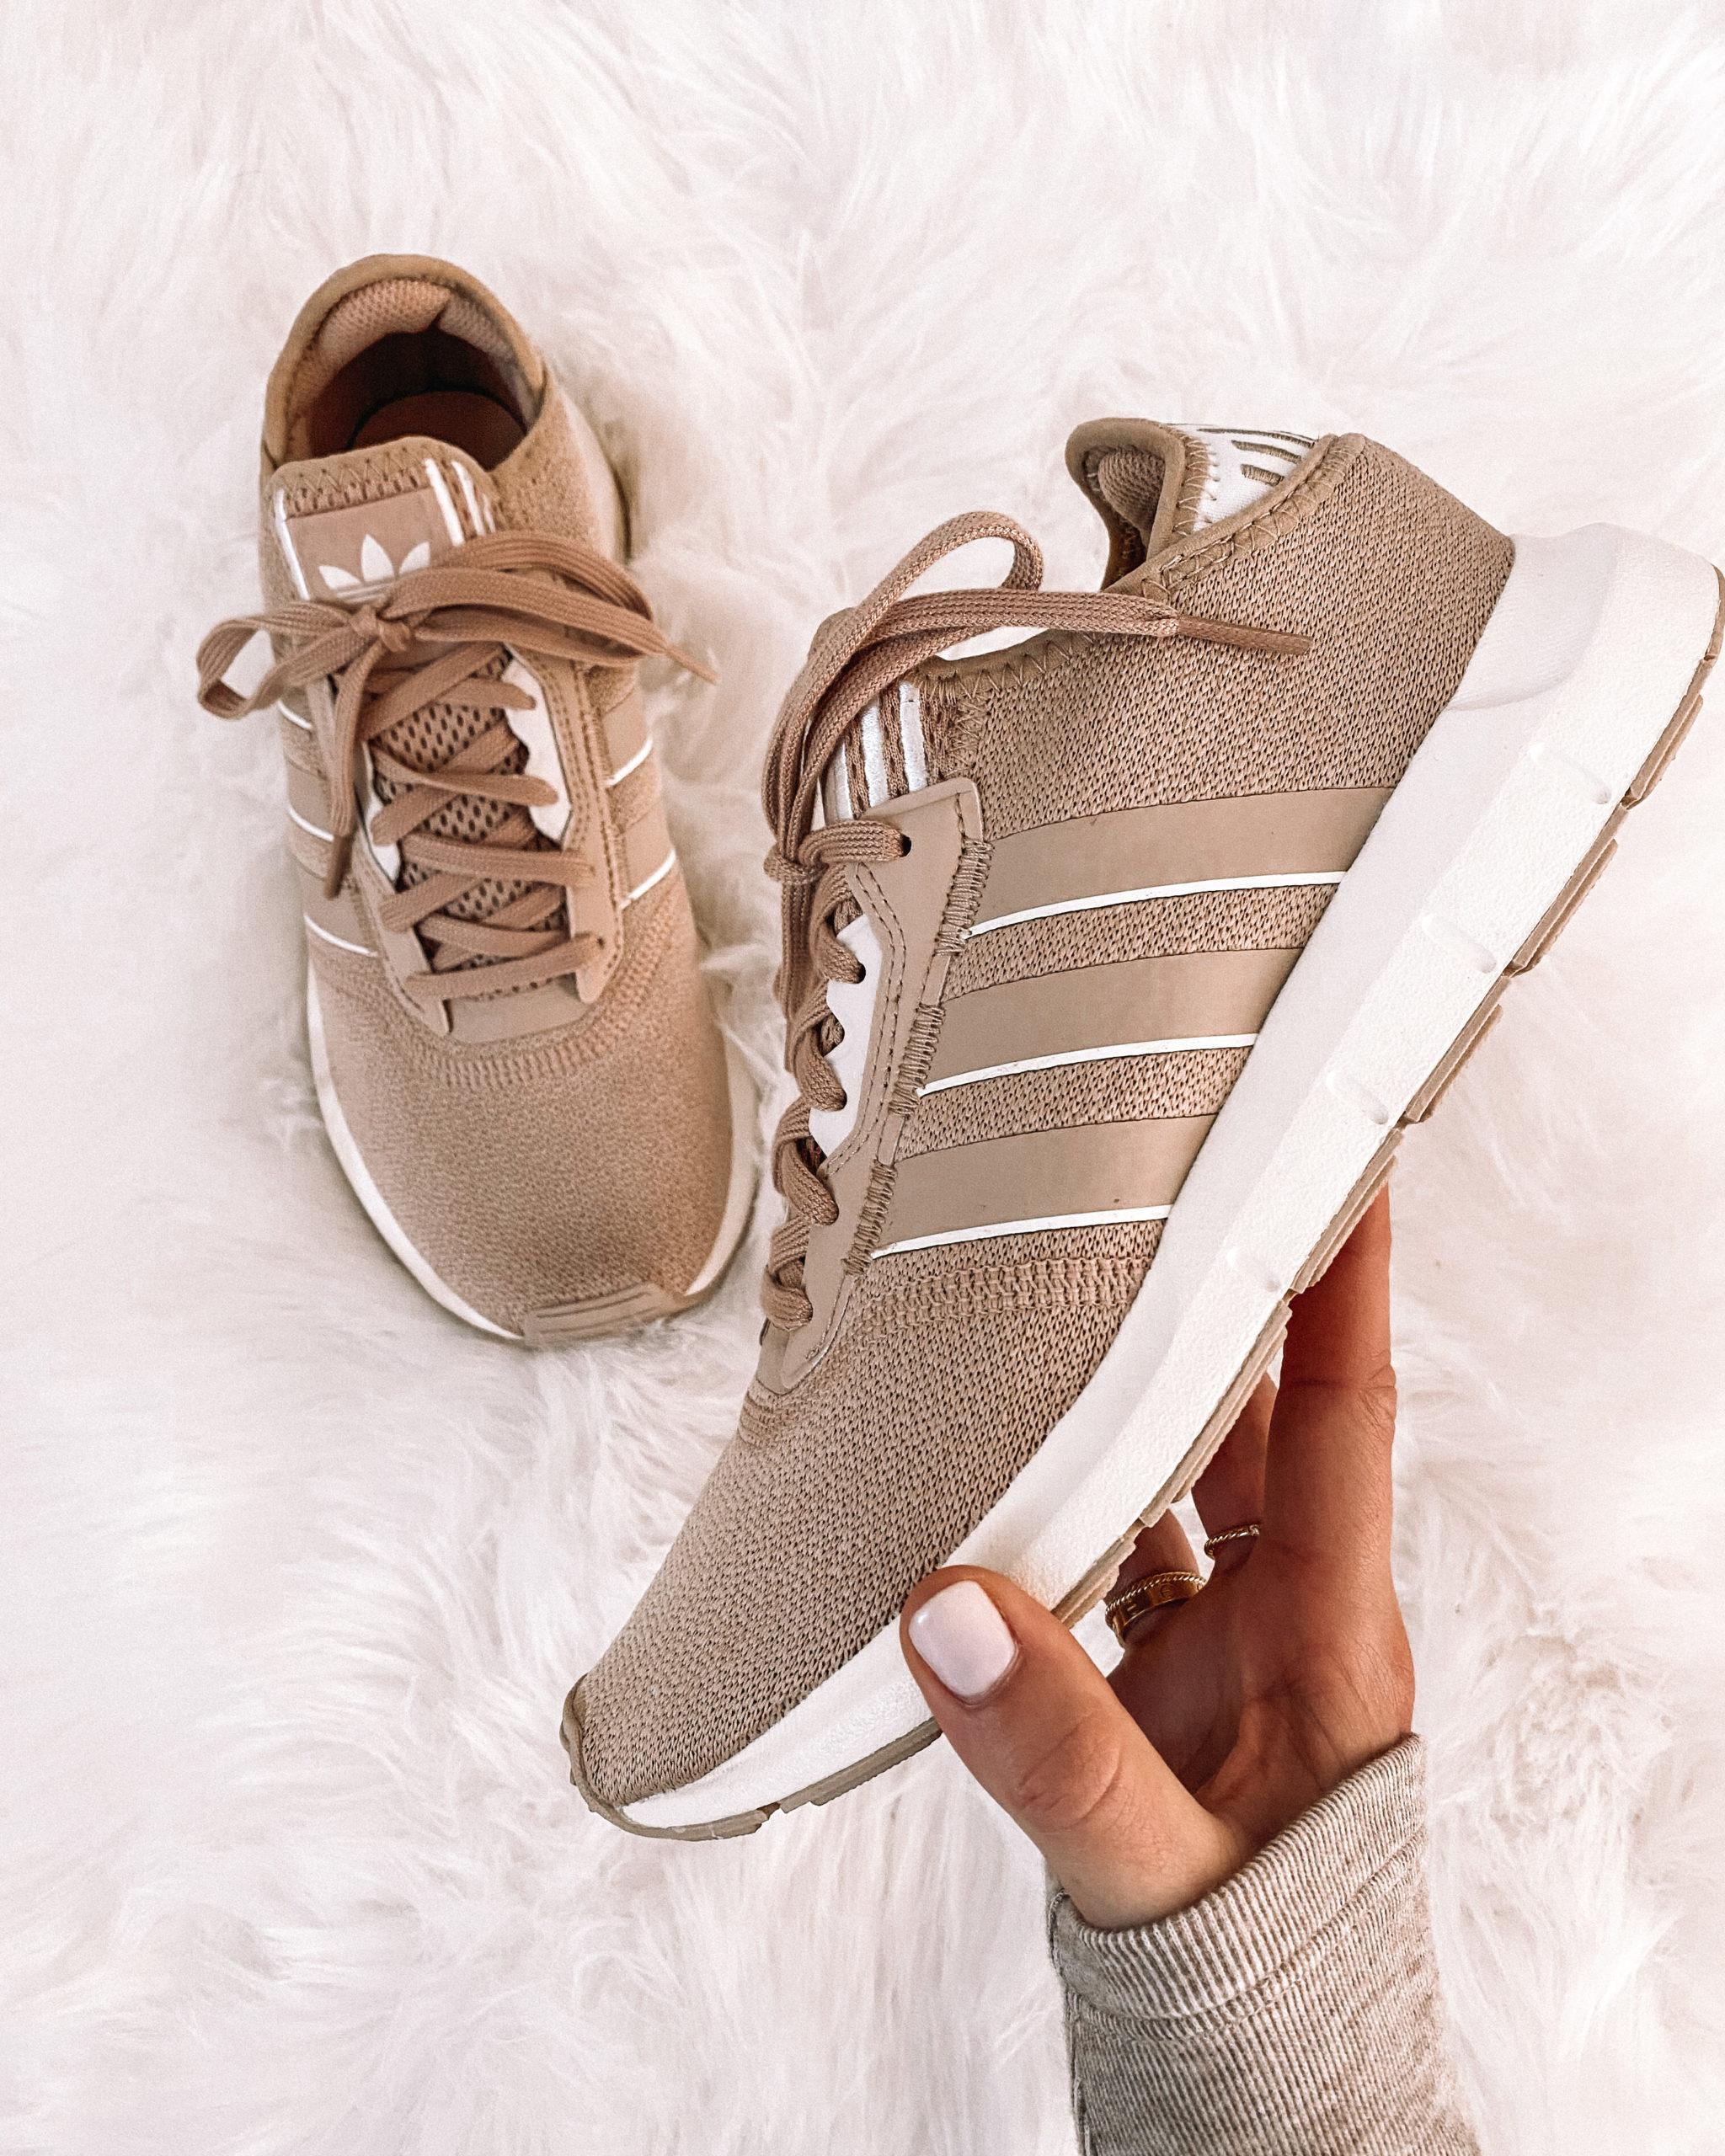 Fashion Jackson adidas Originals Swift Run x Casual Shoes Beige